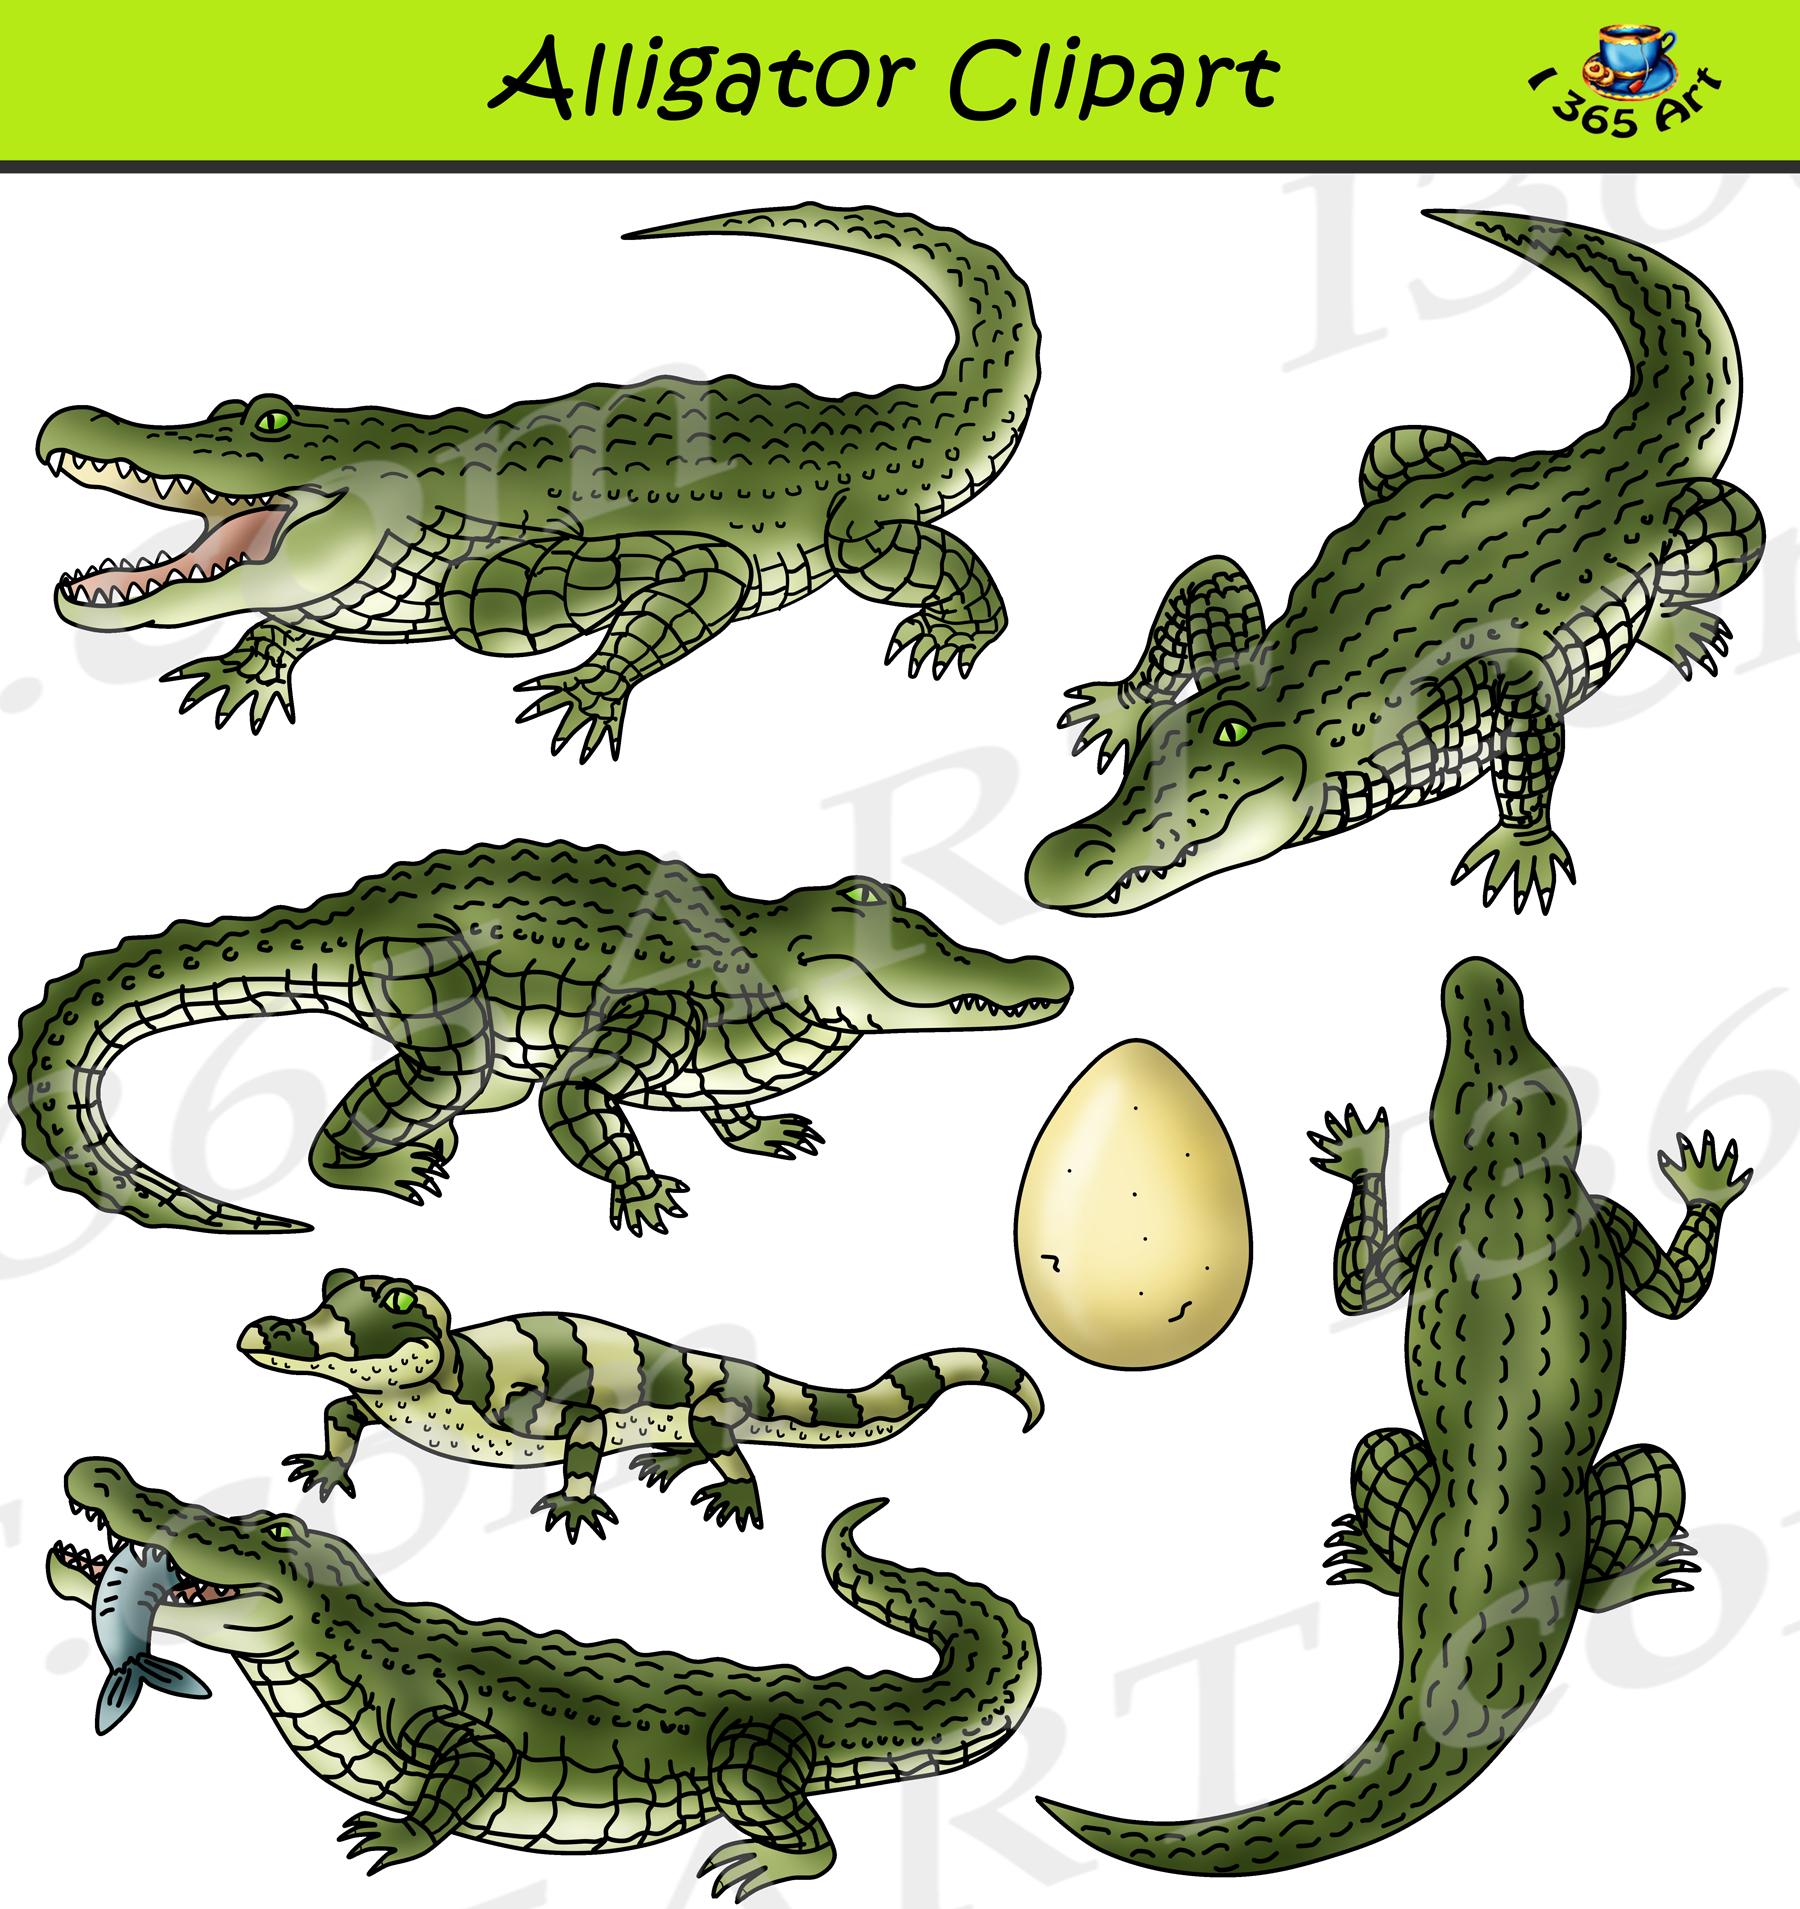 Gator clipart realistic. Alligator set graphics download